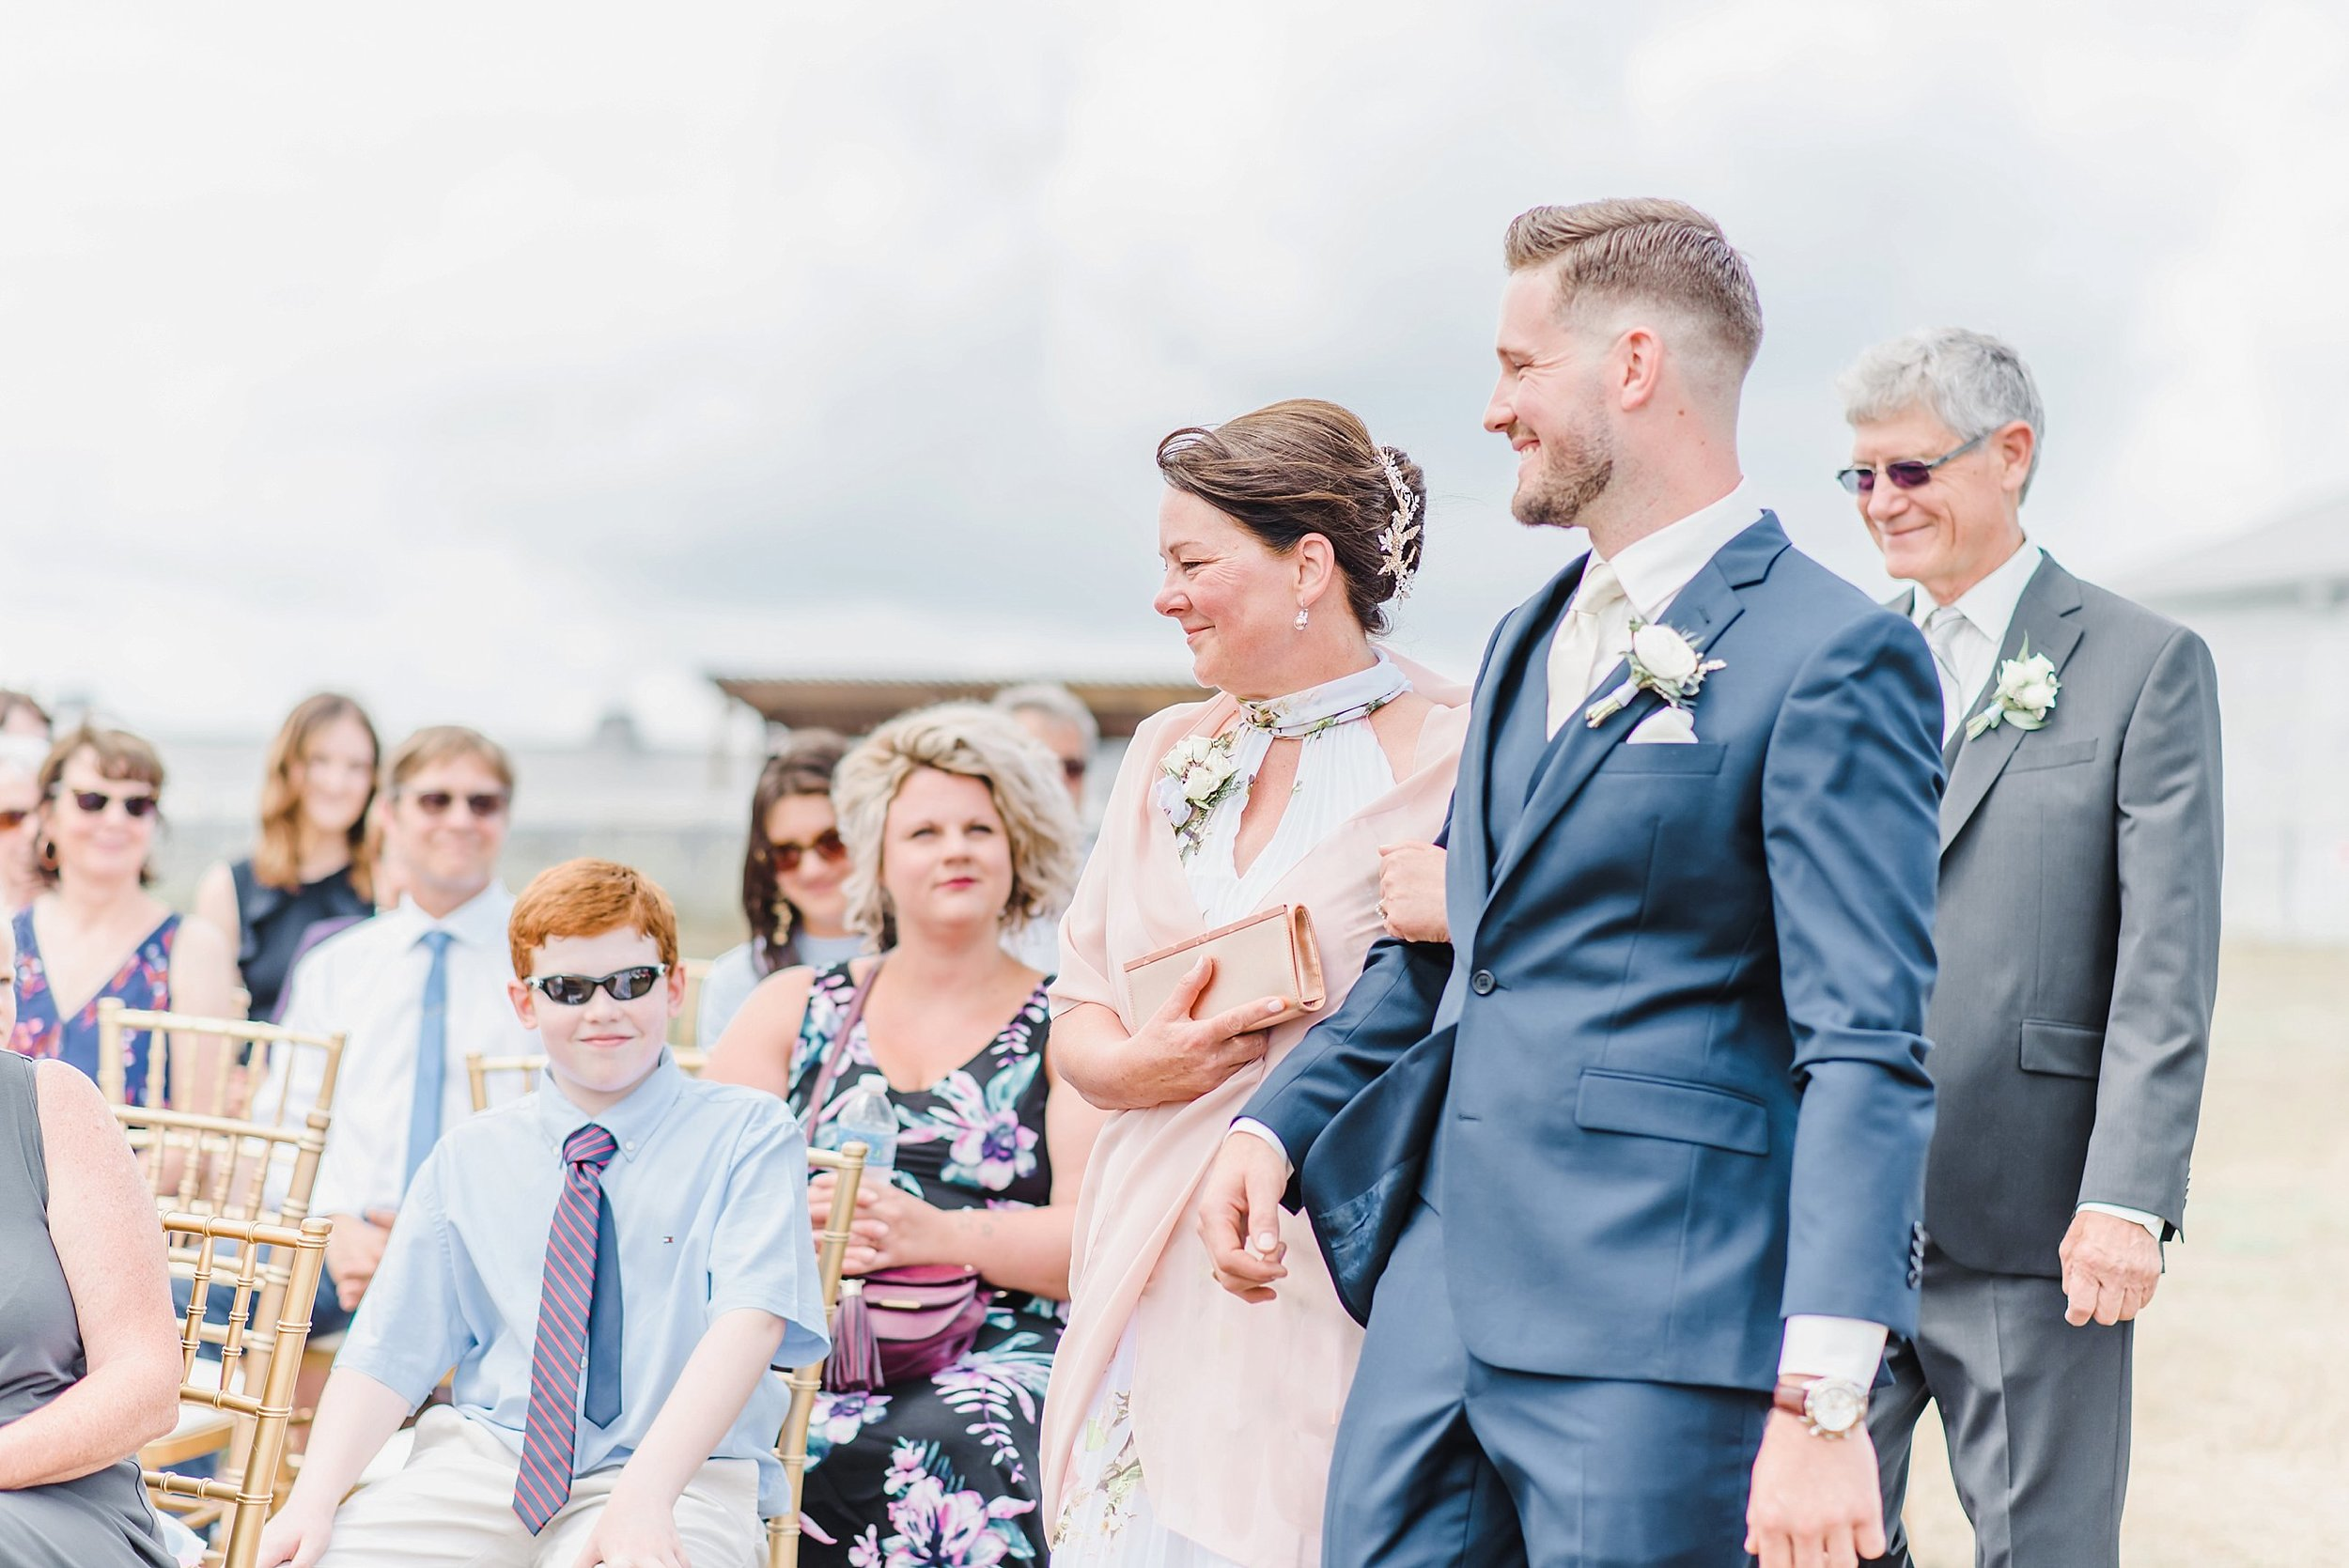 light airy indie fine art ottawa wedding photographer | Ali and Batoul Photography_0178.jpg